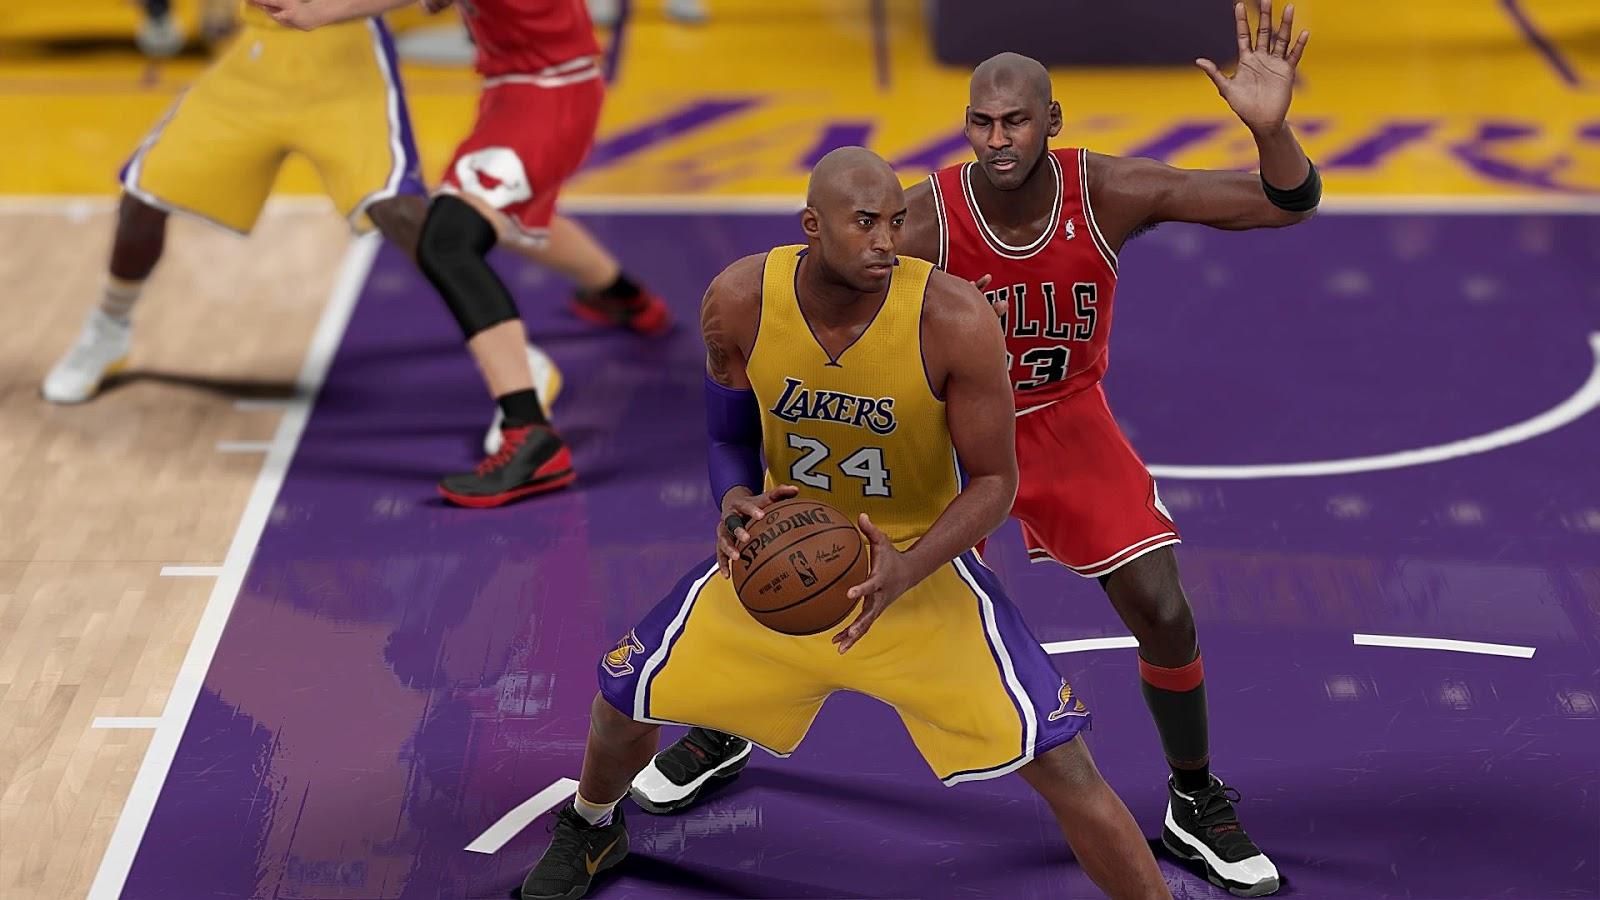 Turnamen Game NBA 2K17 Ramaikan NBA All-Star